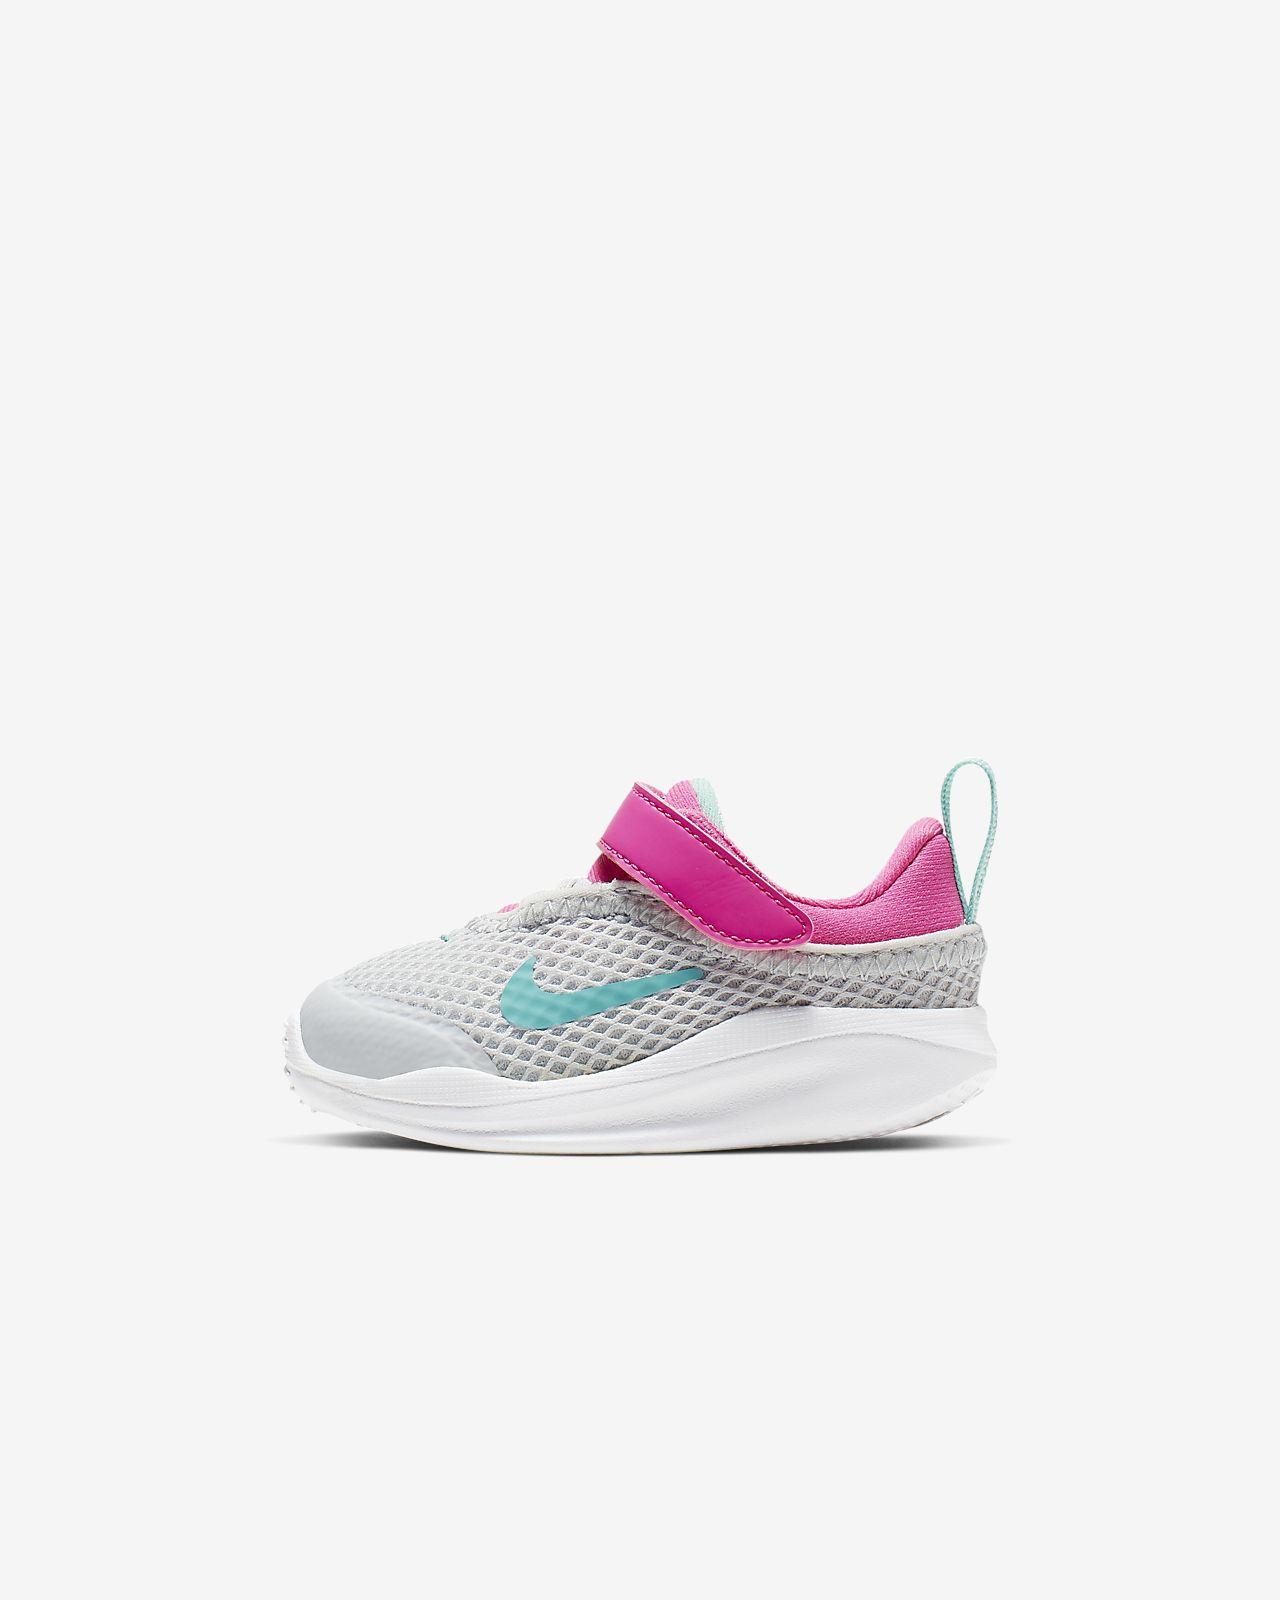 6b2ea6da91 Nike ACMI Baby/Toddler Shoe. Nike.com